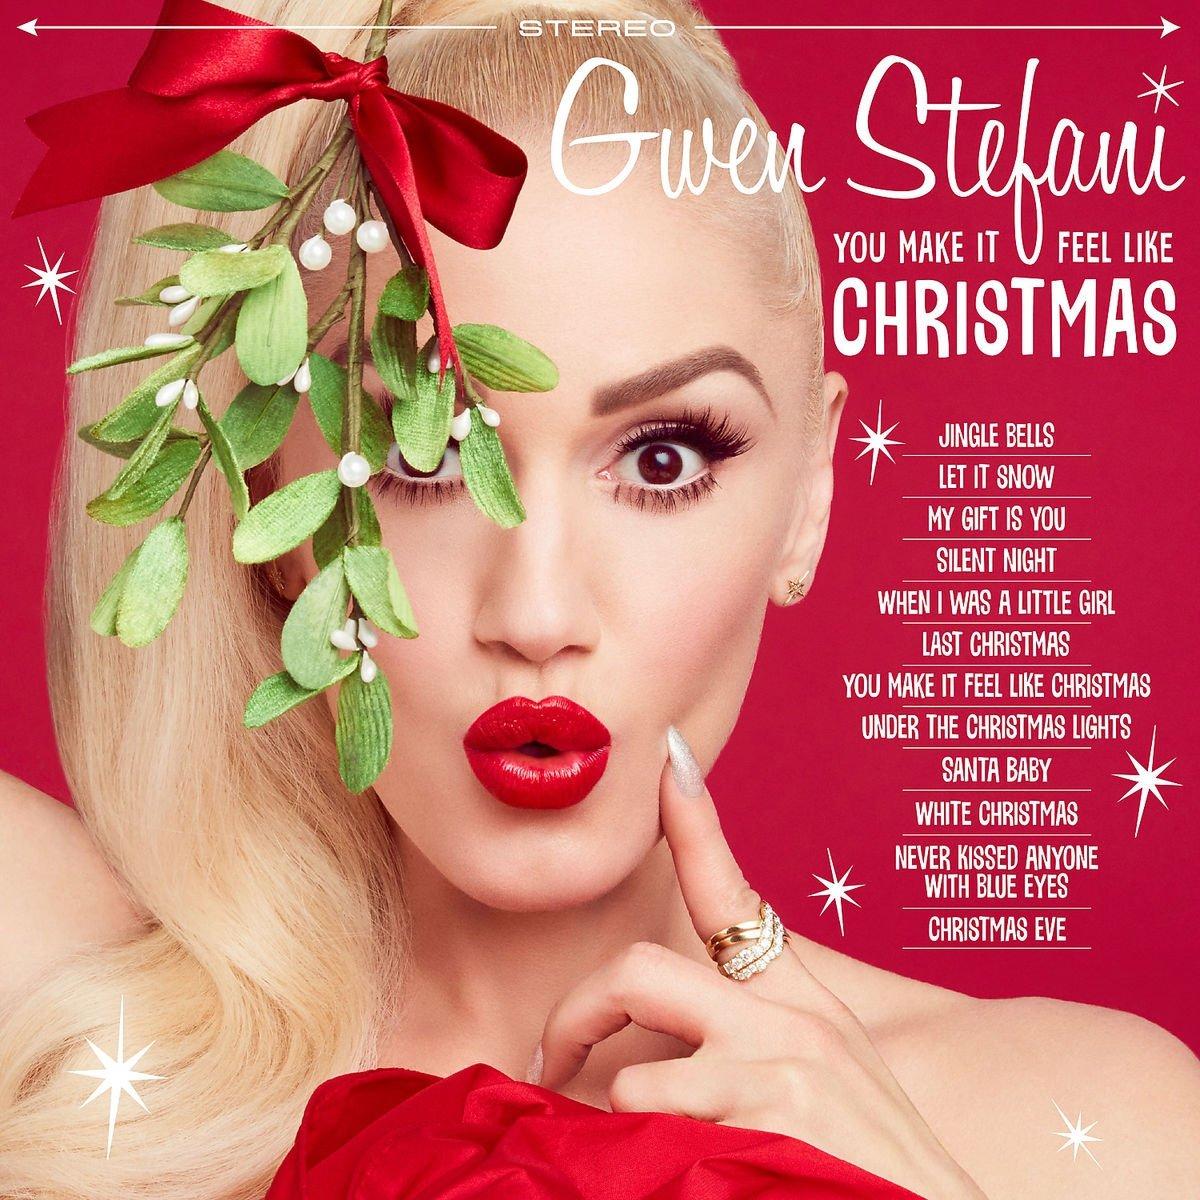 Gwen Stefani - You Make It Feel Like Christmas - Amazon.com Music